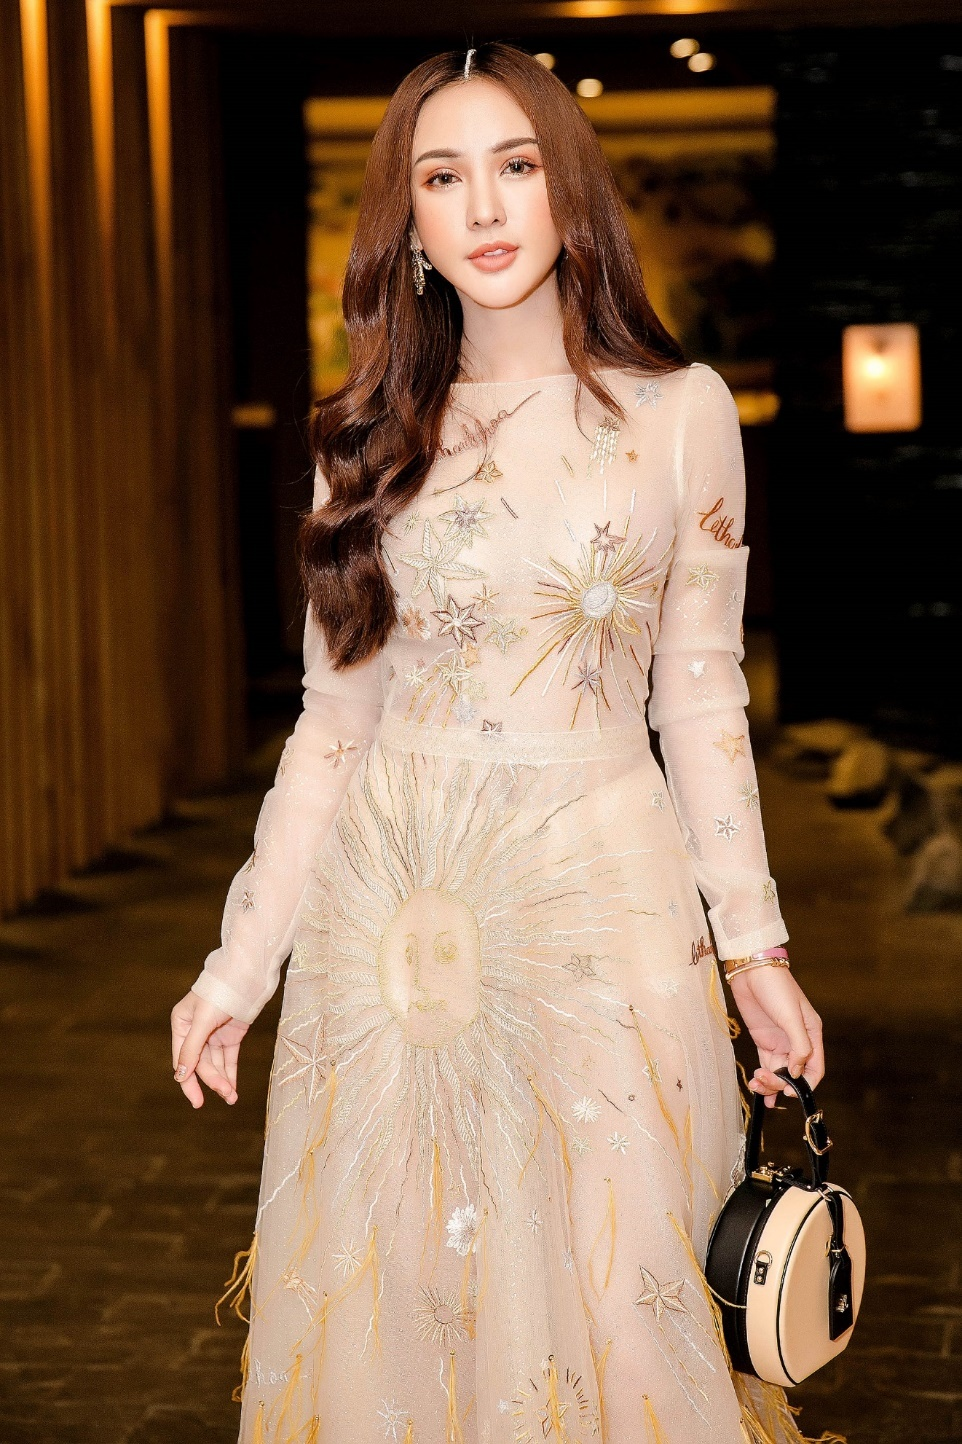 Angela Phuong Trinh hoa cong chua vay hoa, Sam quyen ru trong su kien hinh anh 6